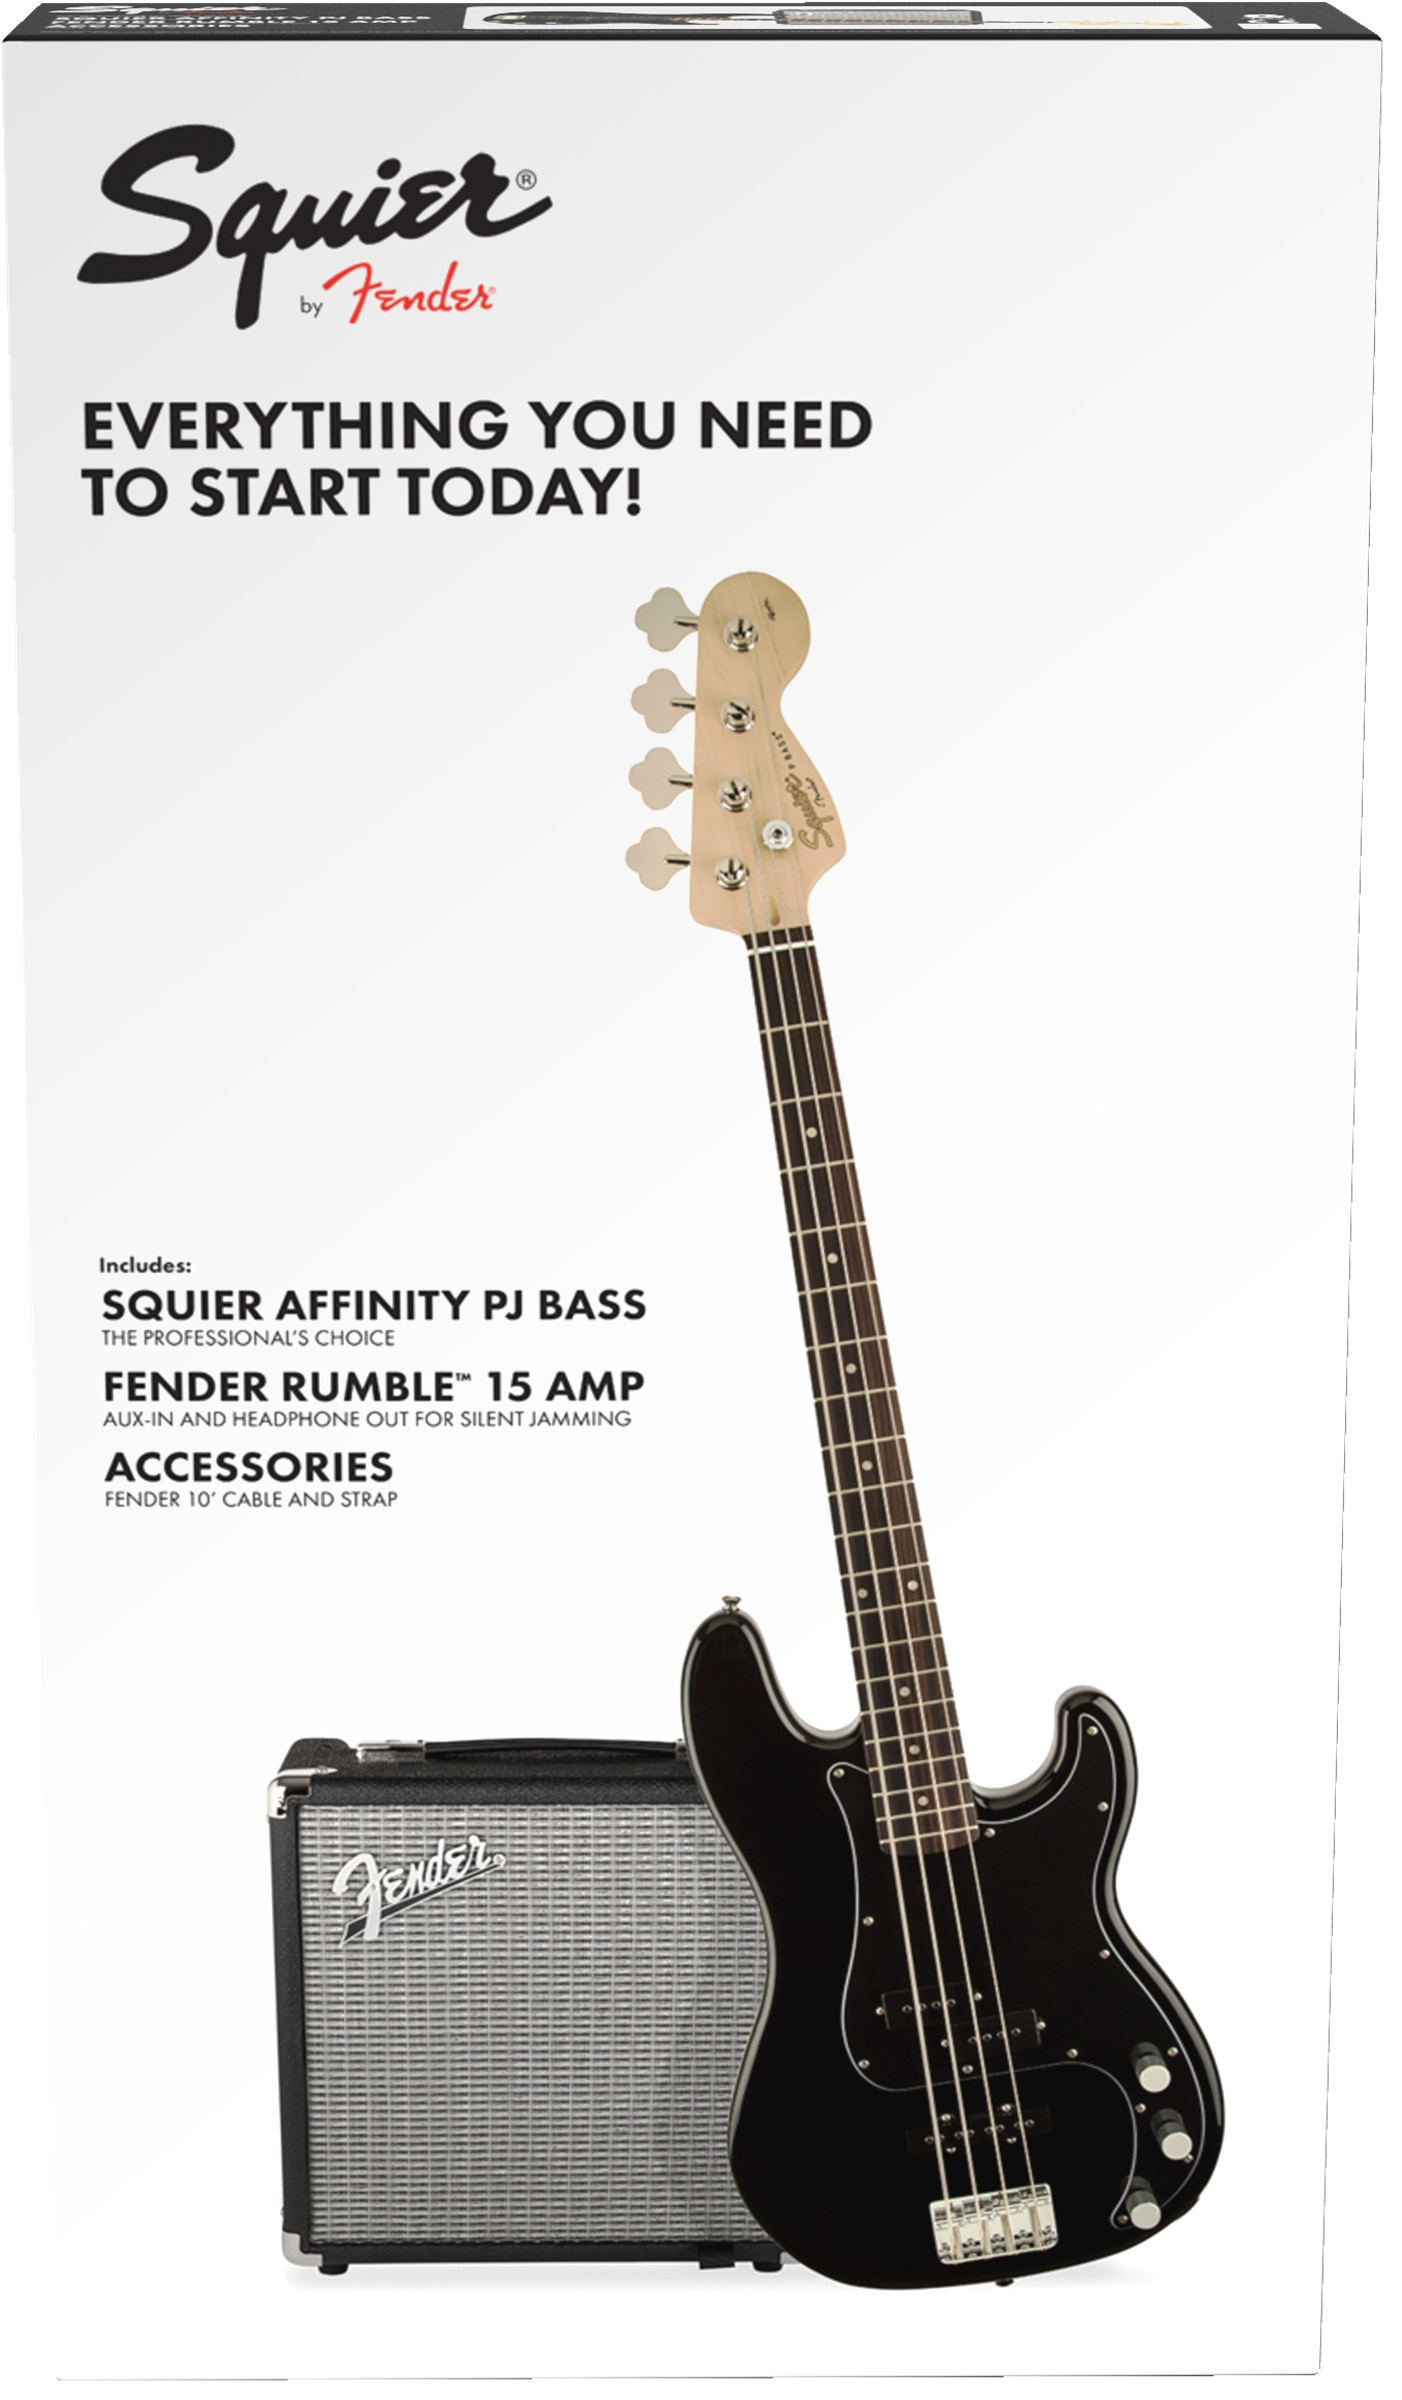 Squier Affinity PJ-Bass Black/Fender Rumble 15 Set